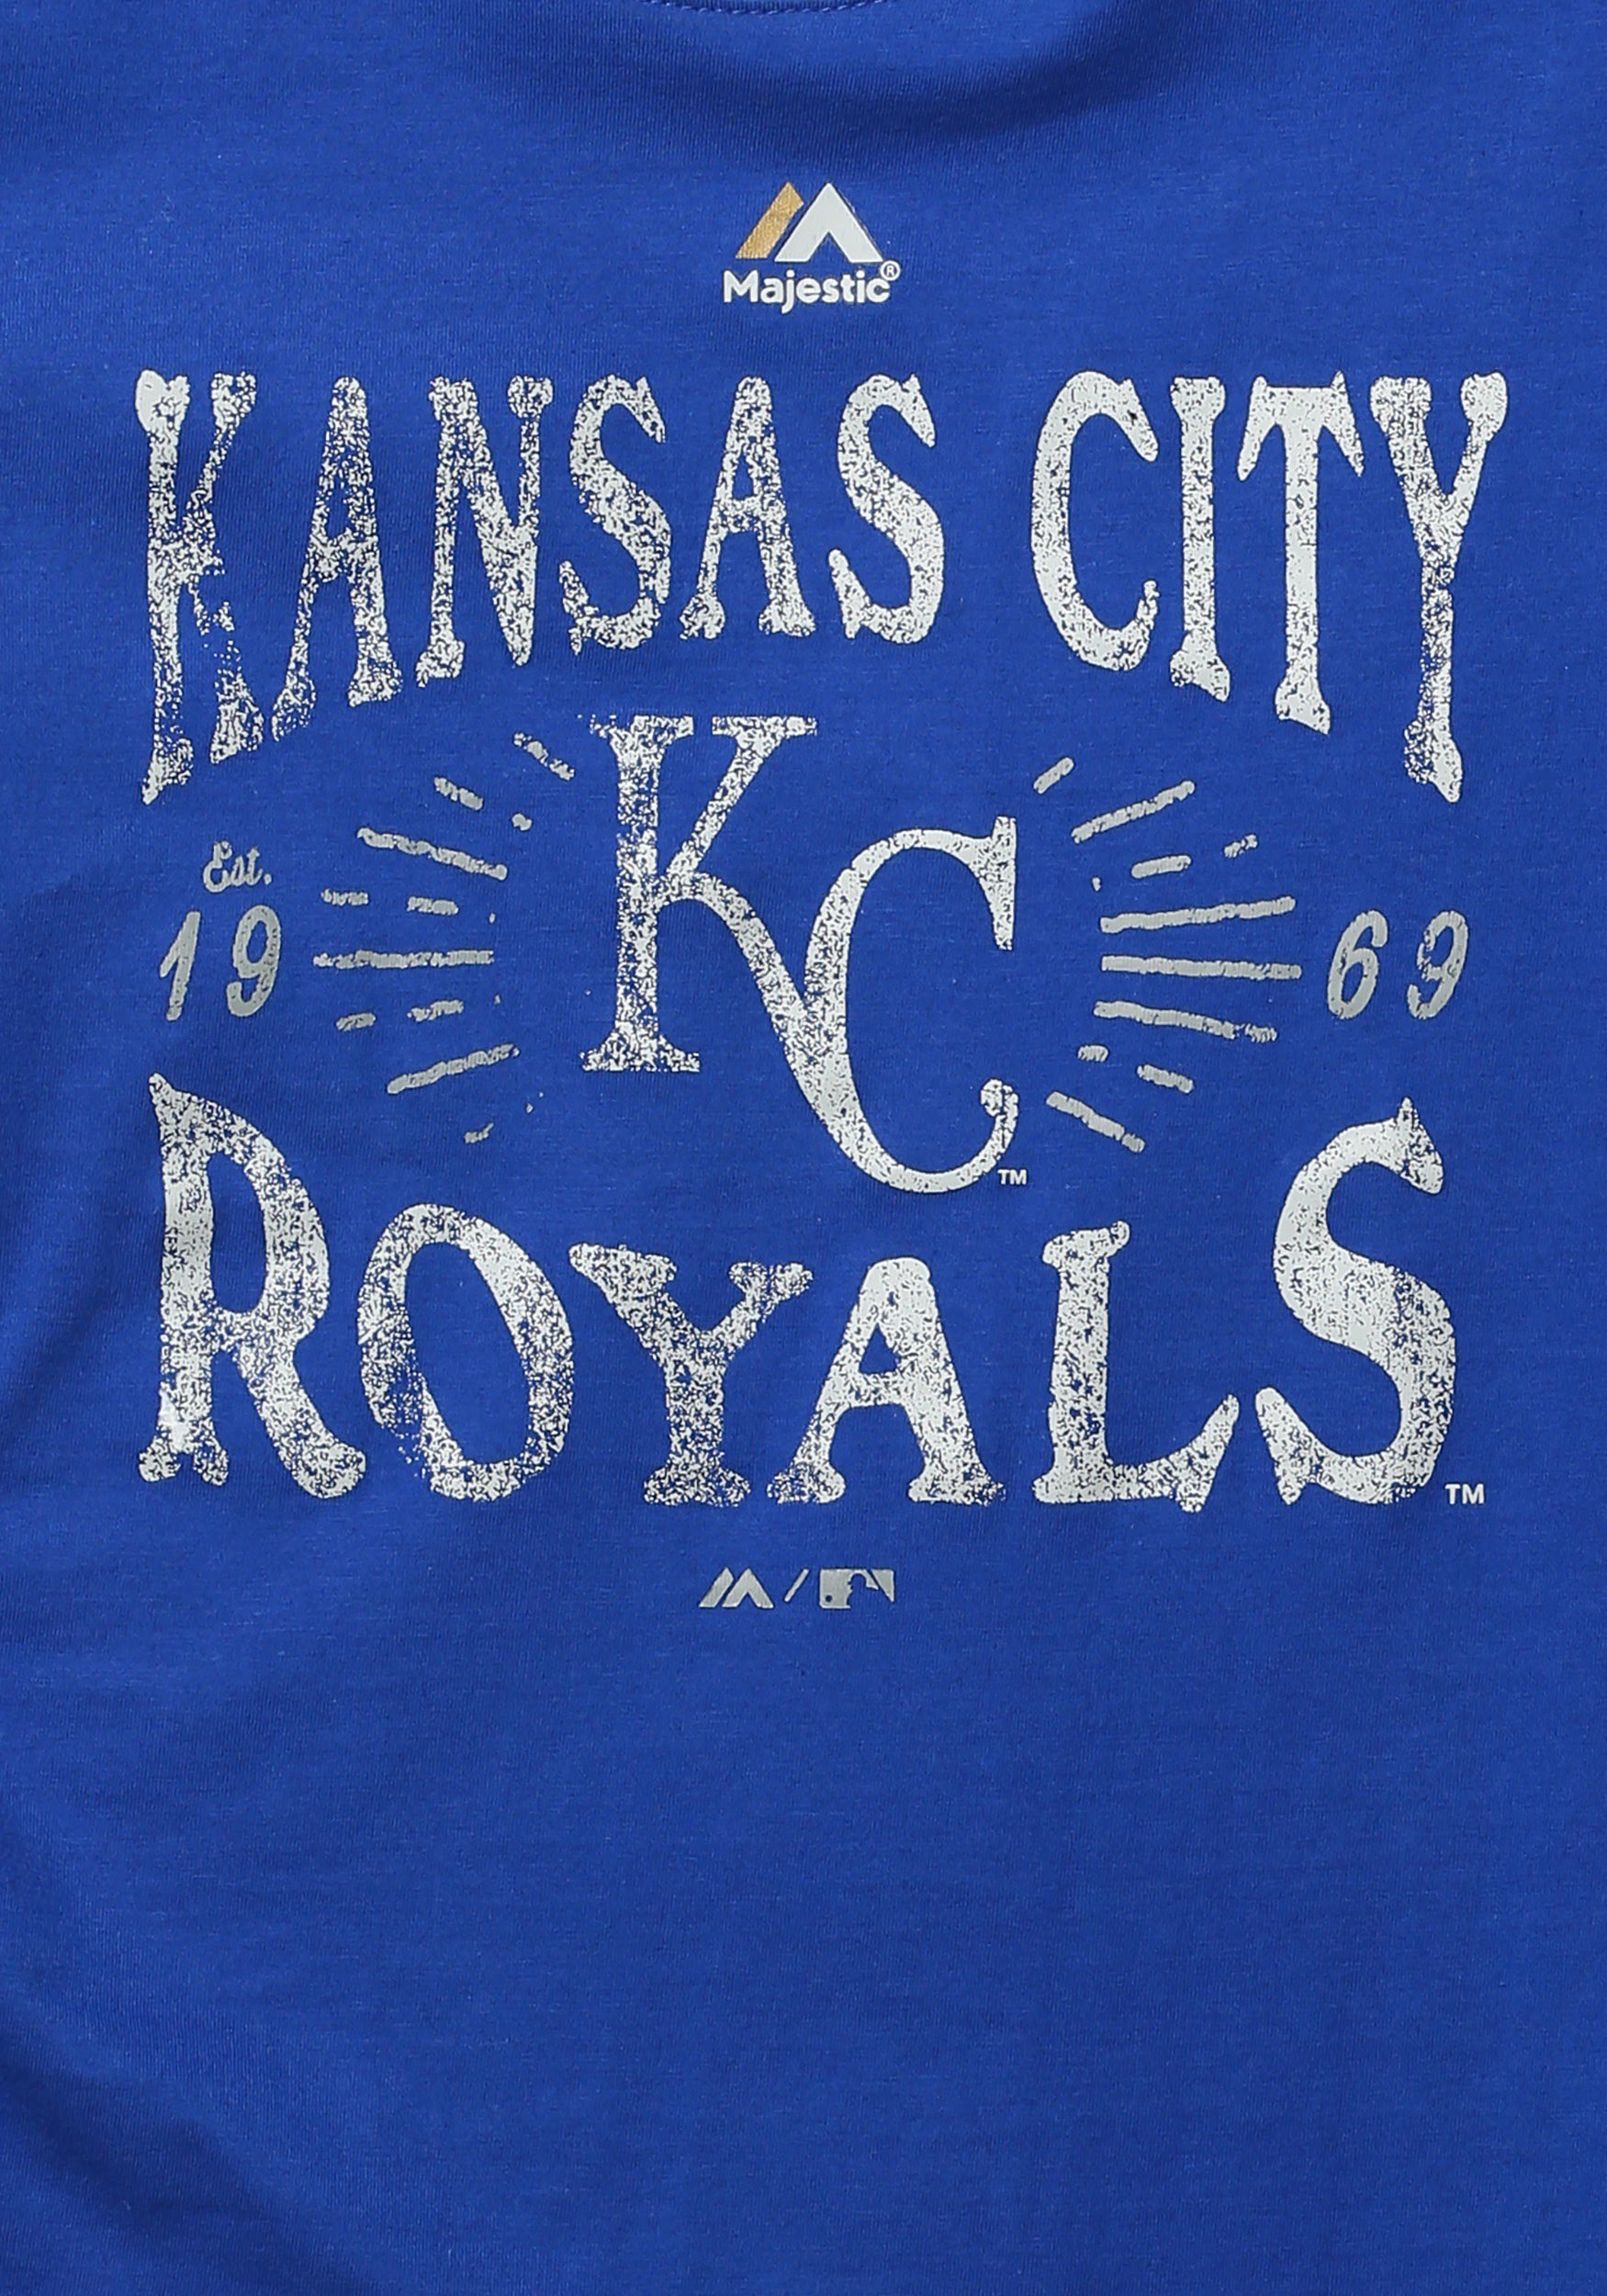 … Kansas City Royals Round the Bases Kids T-Shirt1